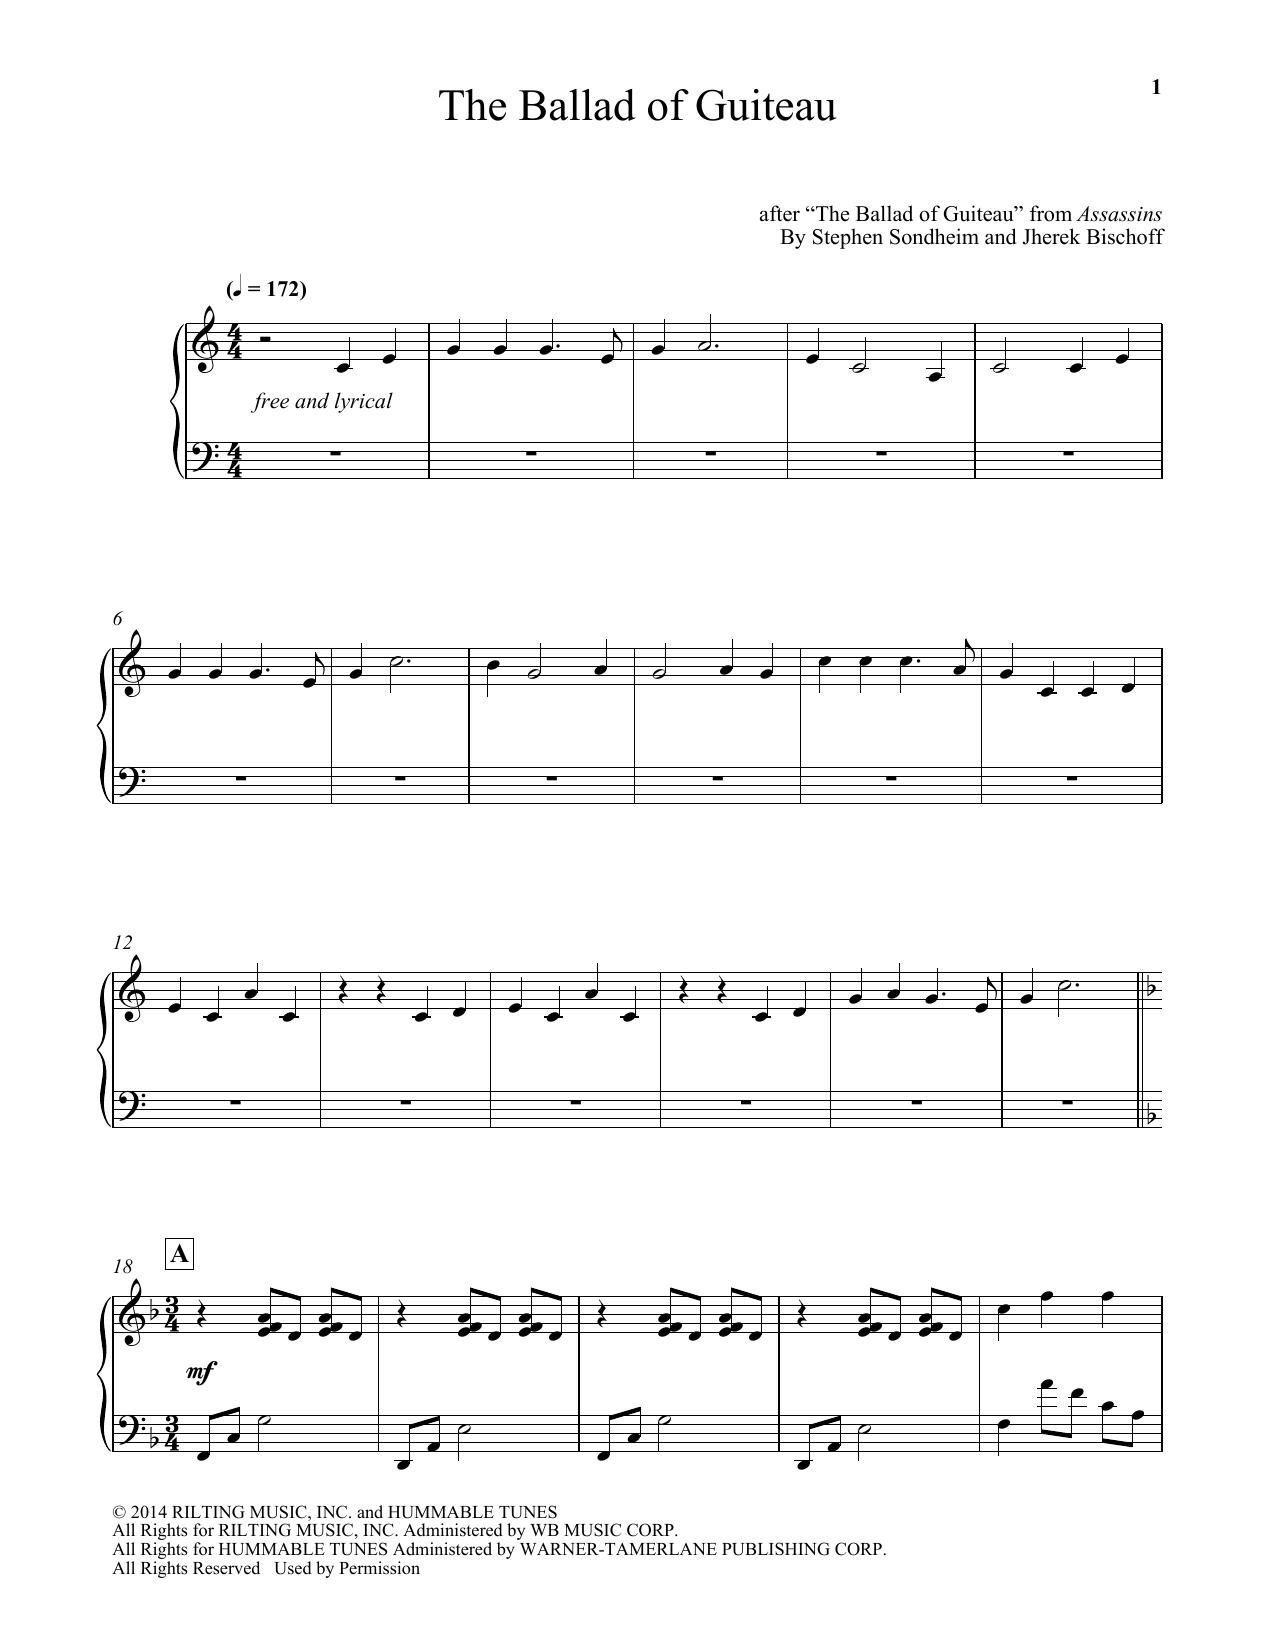 The Ballad Of Guiteau (arr. Jherek Bischoff) Sheet Music